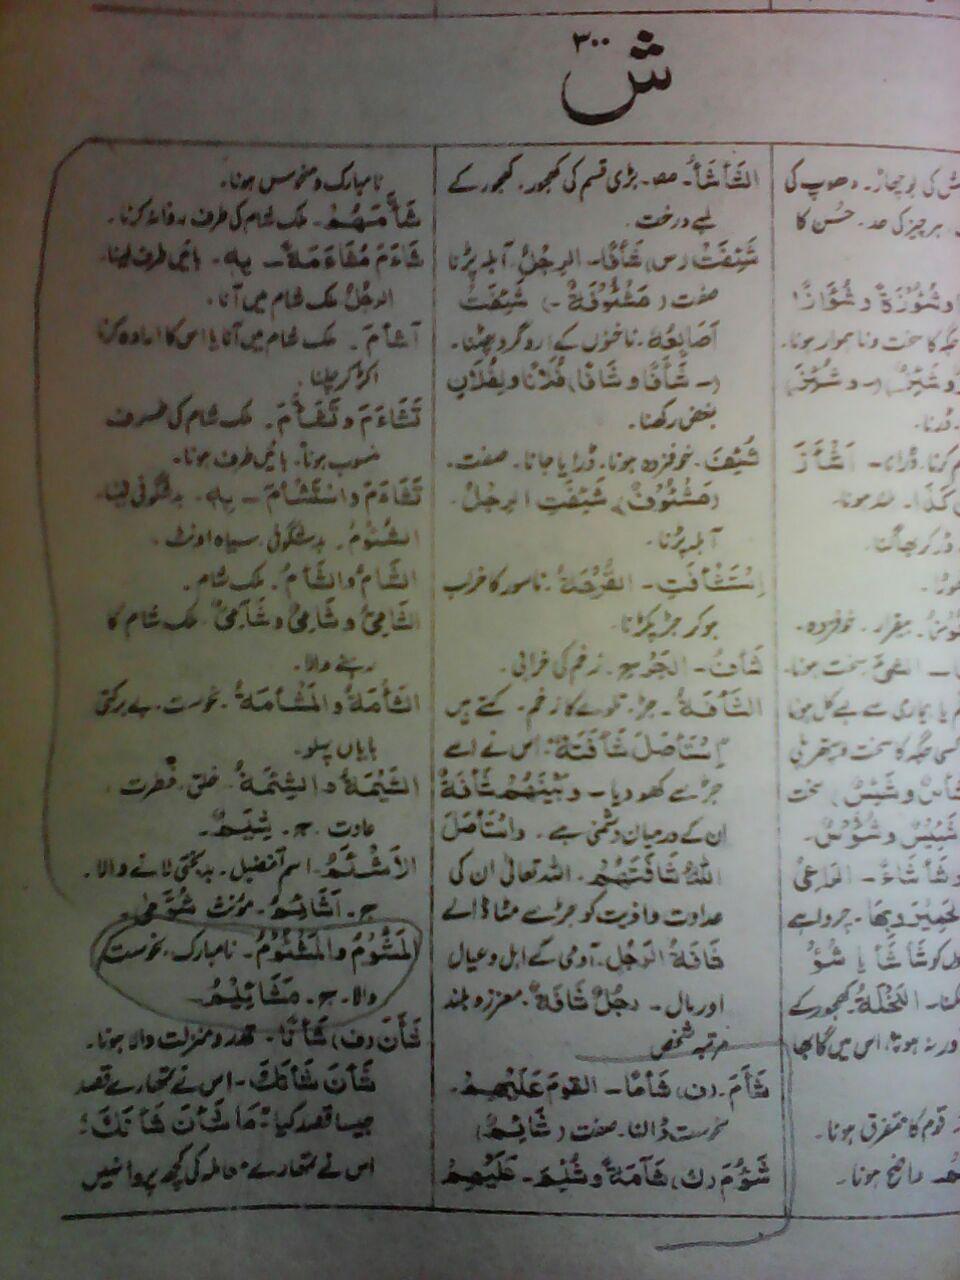 al munjad arabic to urdu dictionary - Best AboutBest About